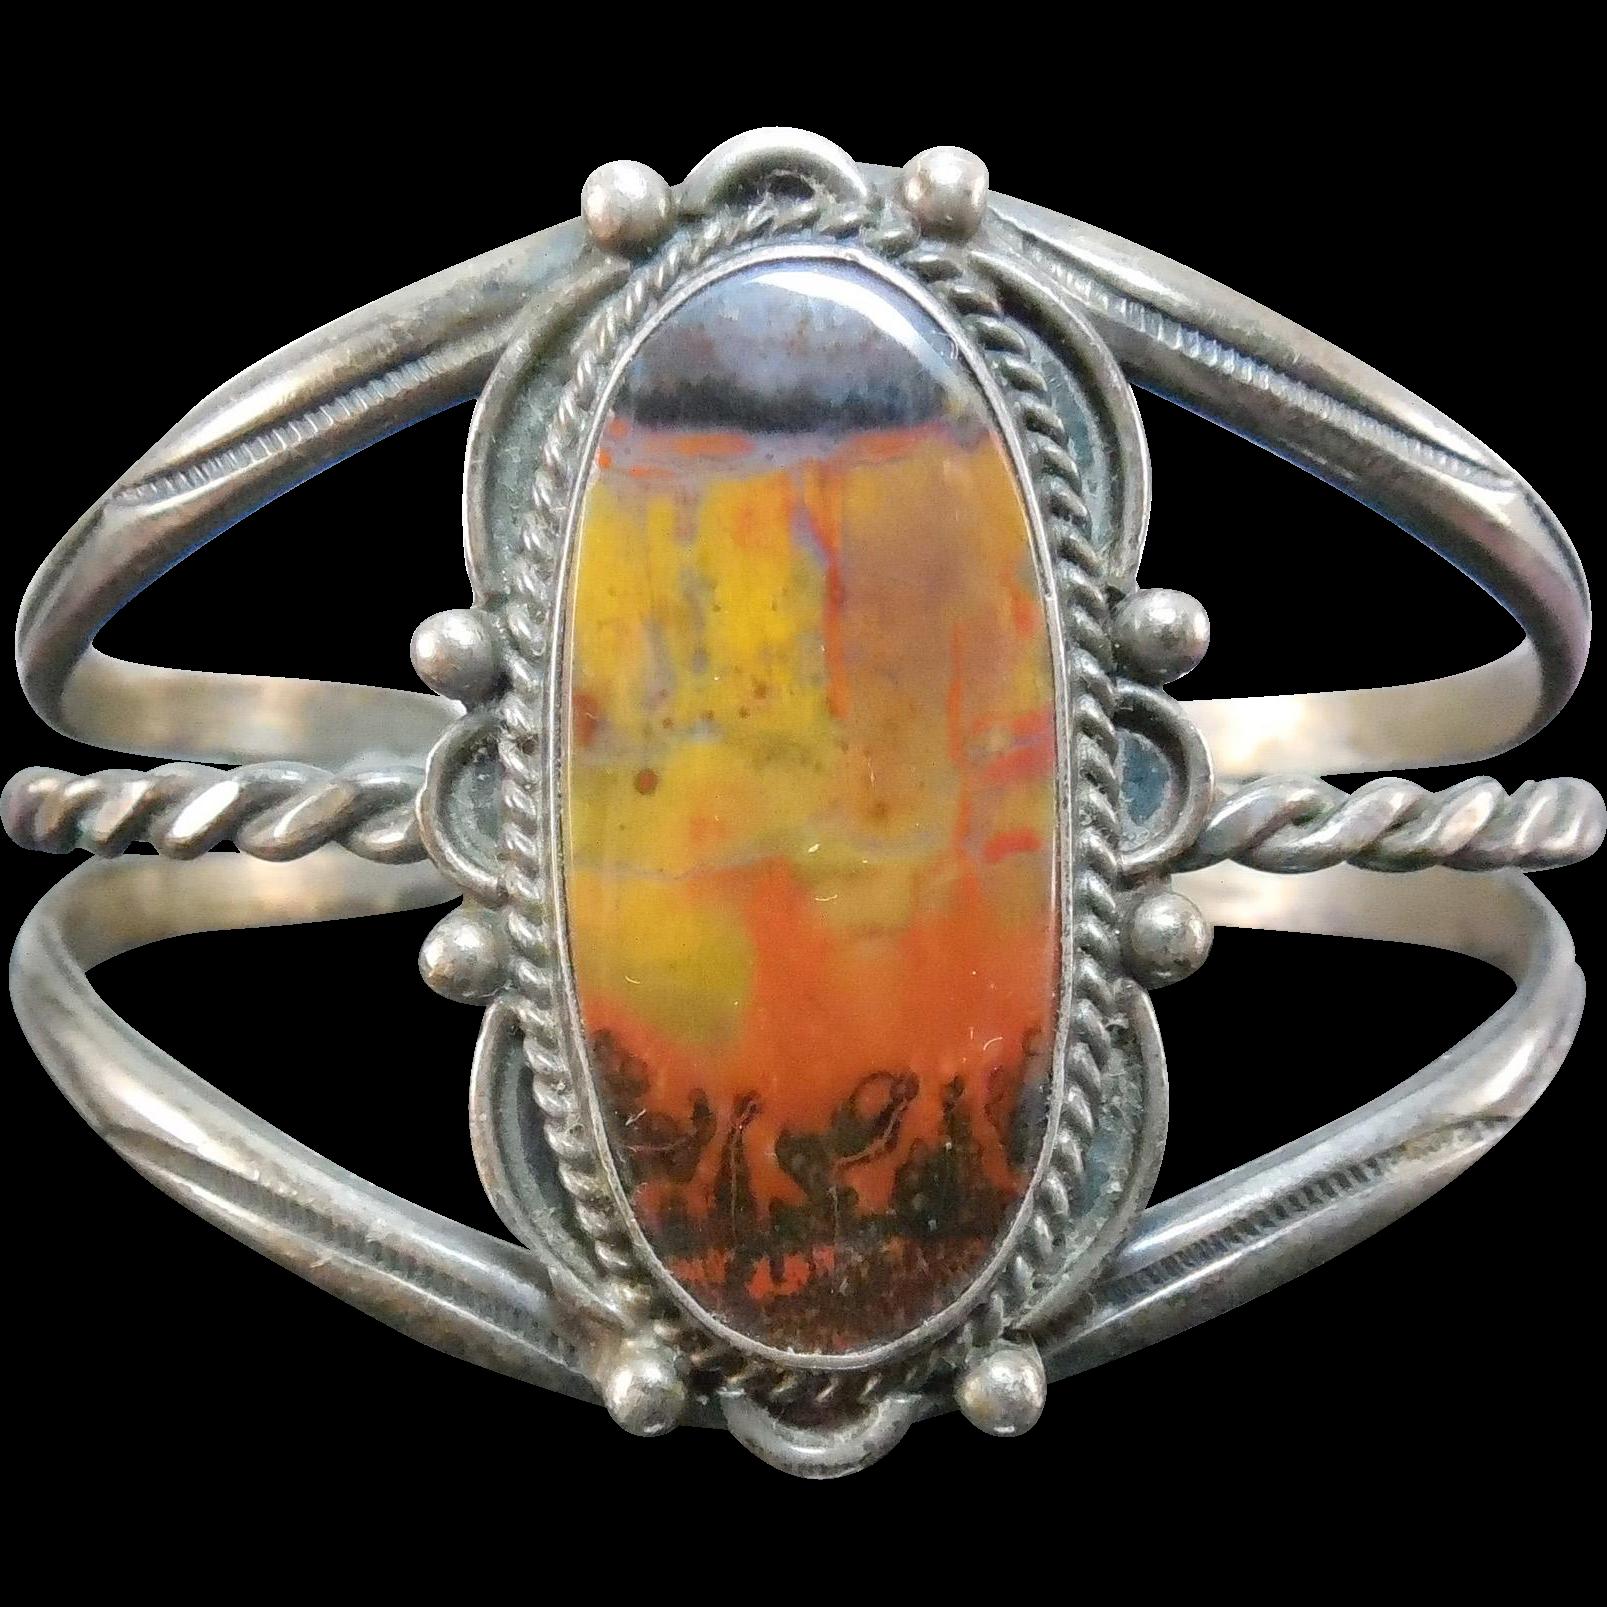 Vintage Native American Navajo Petrified Wood Silver Bracelet - Large Older Bracelet